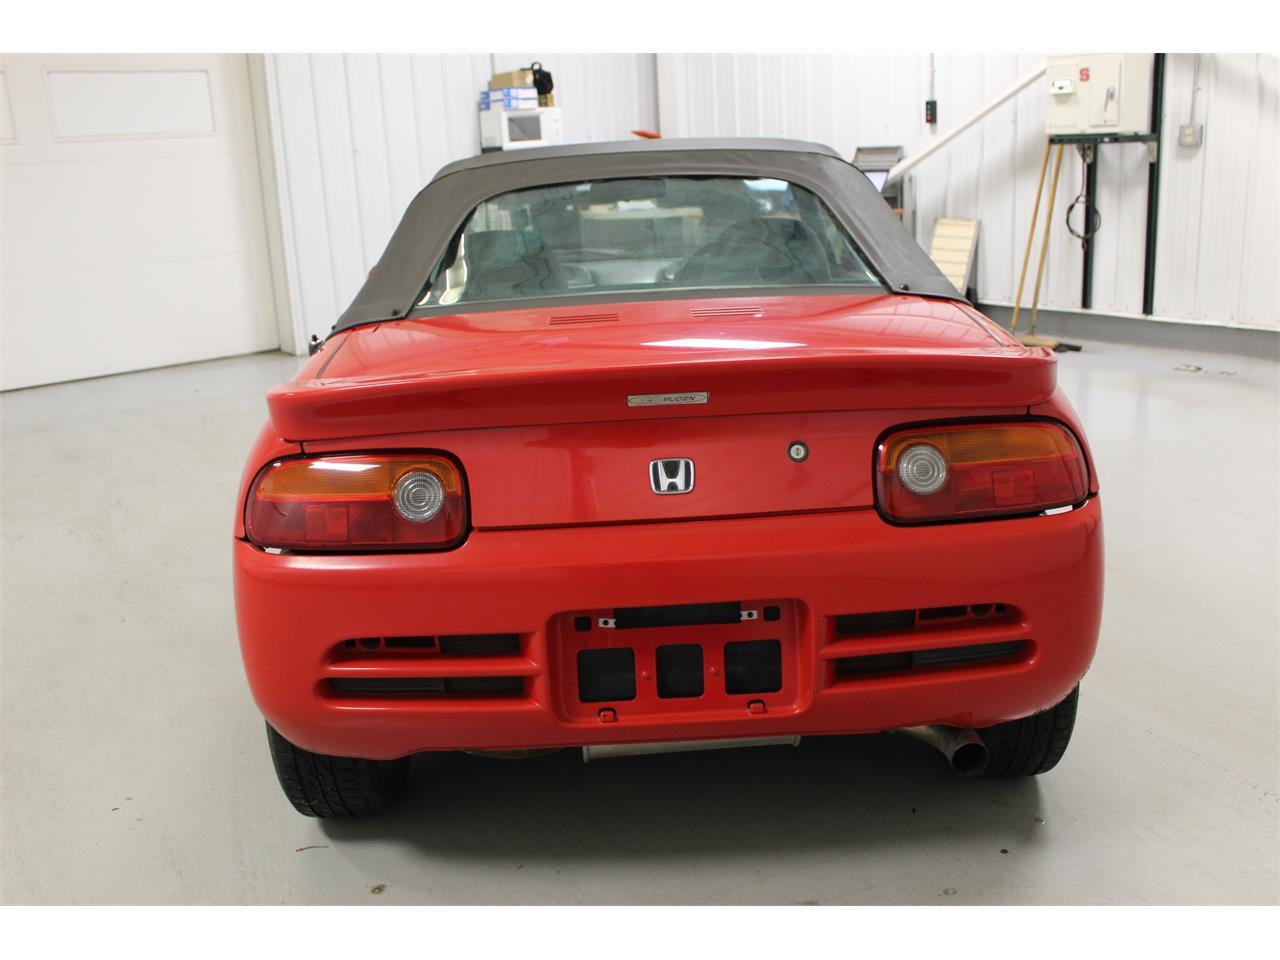 1991 Honda Beat (CC-1171615) for sale in Christiansburg, Virginia